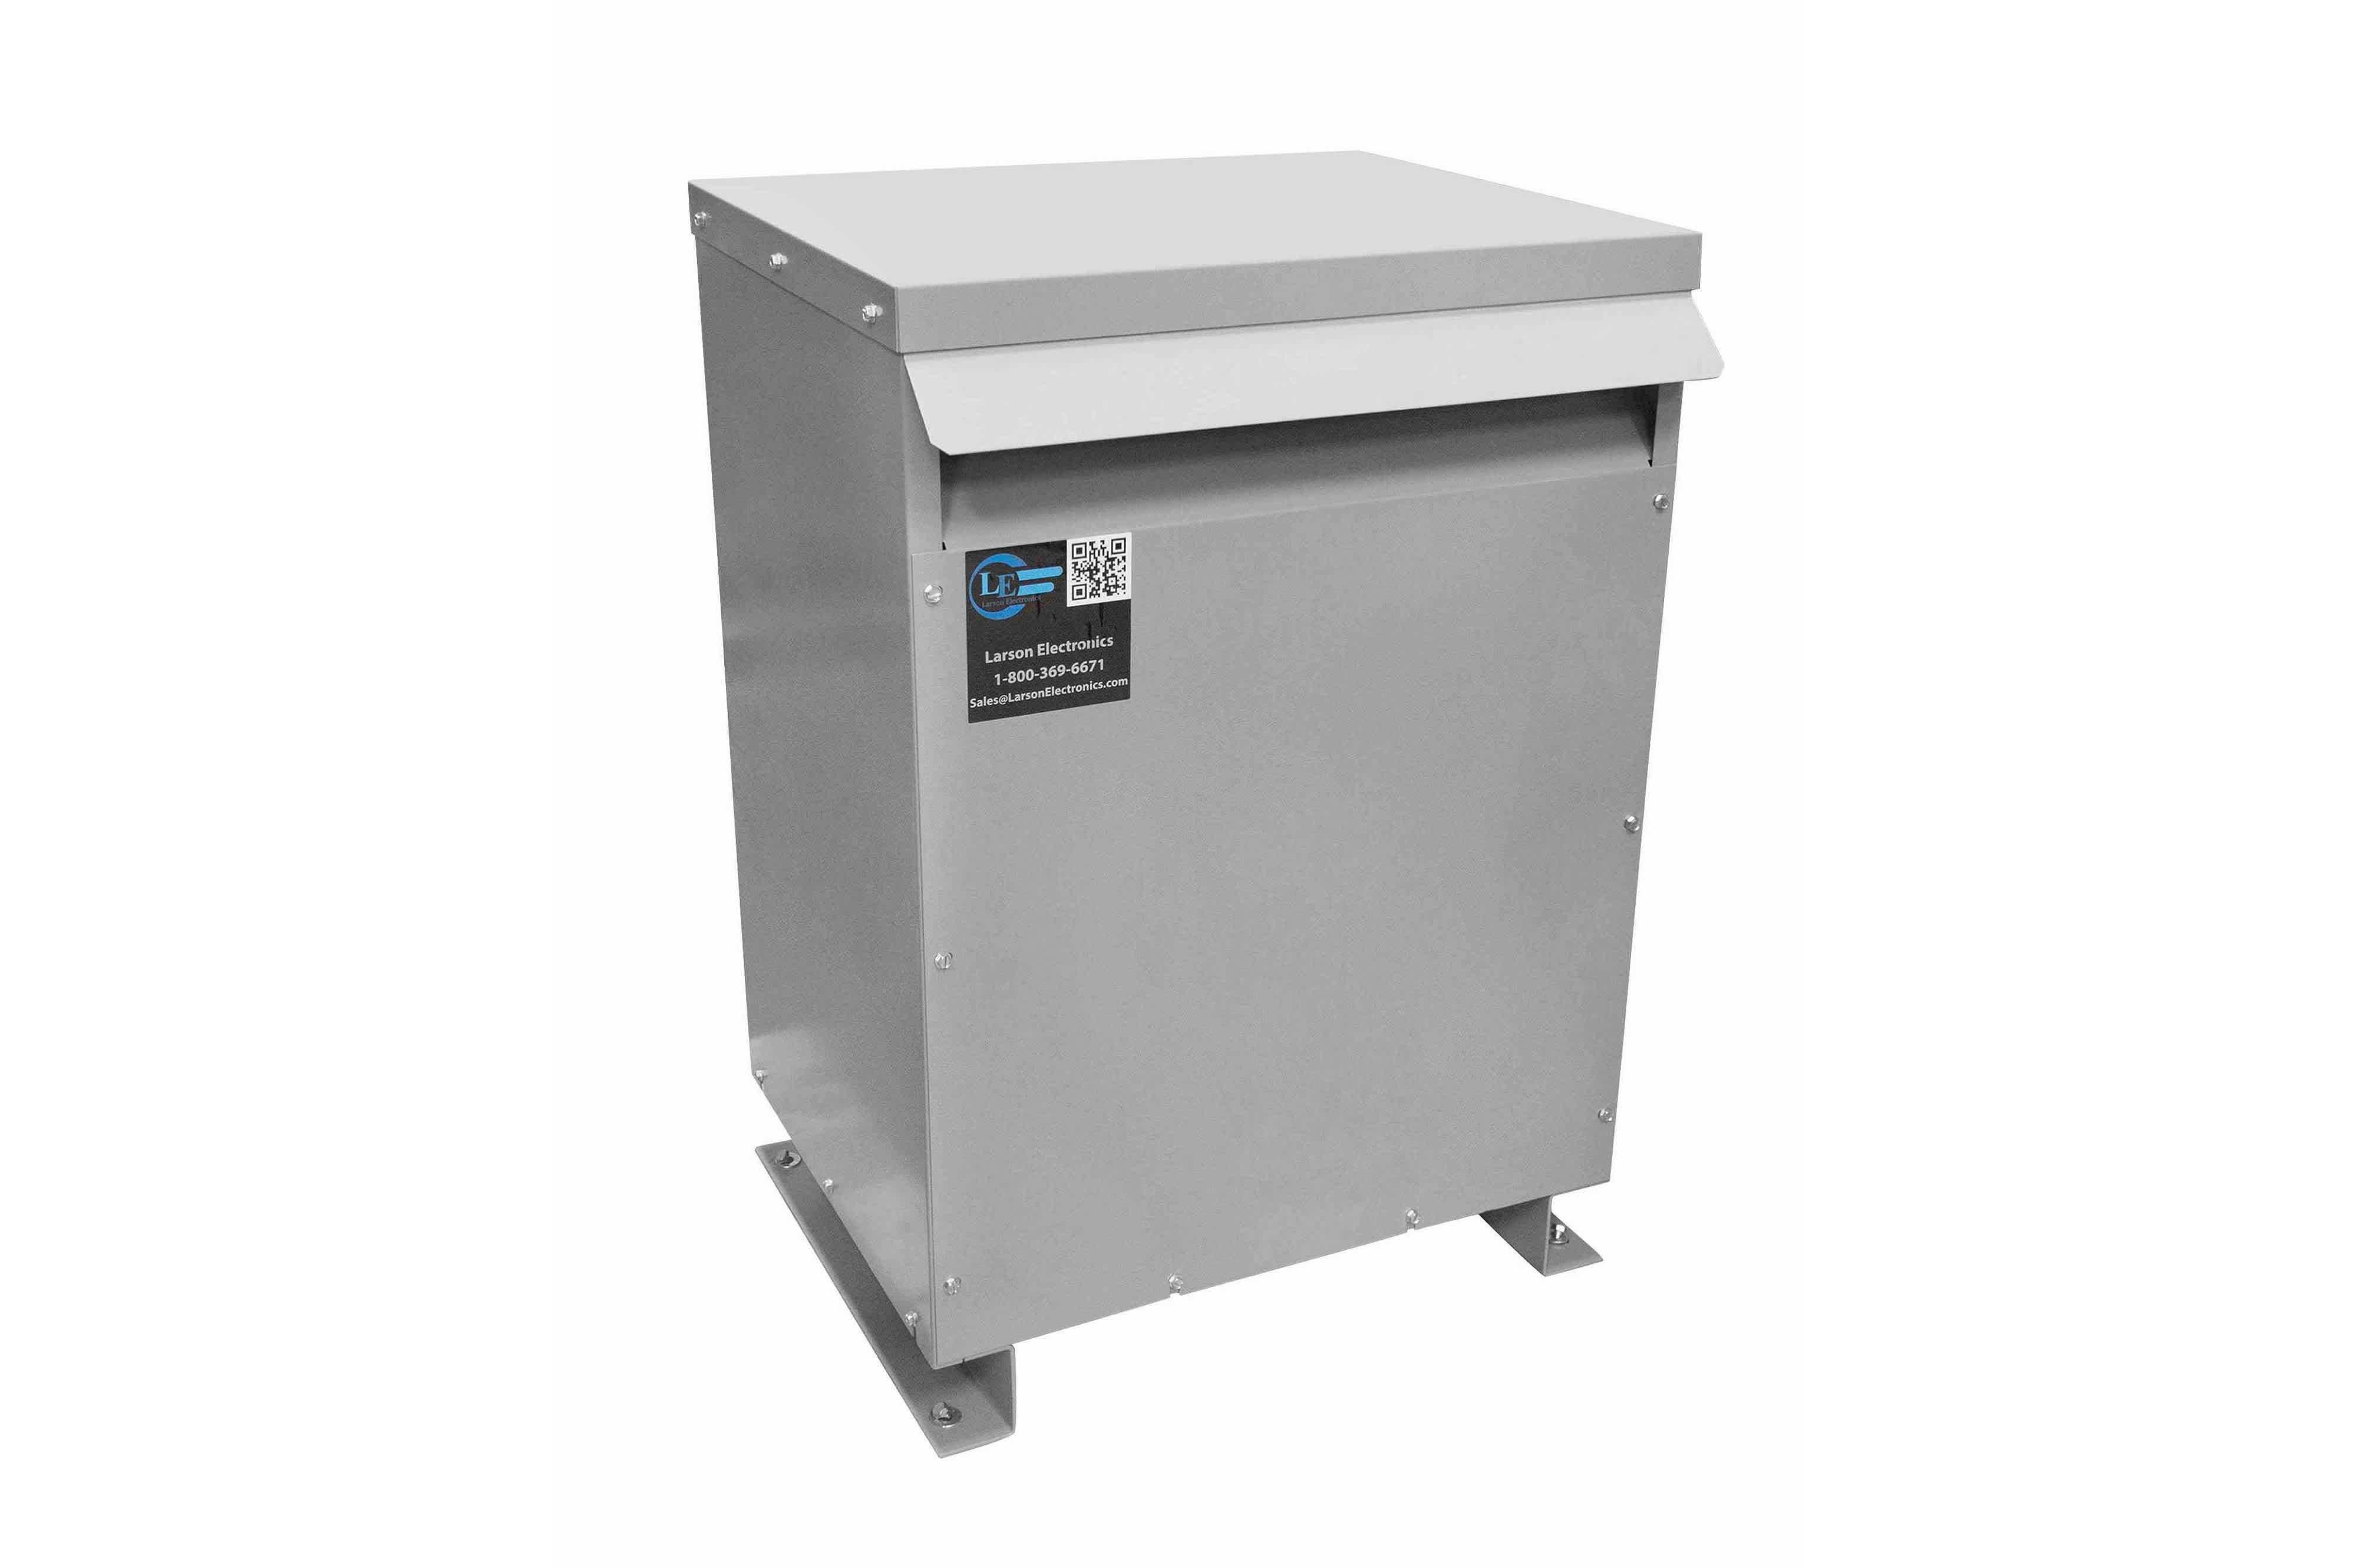 13 kVA 3PH Isolation Transformer, 380V Wye Primary, 208Y/120 Wye-N Secondary, N3R, Ventilated, 60 Hz